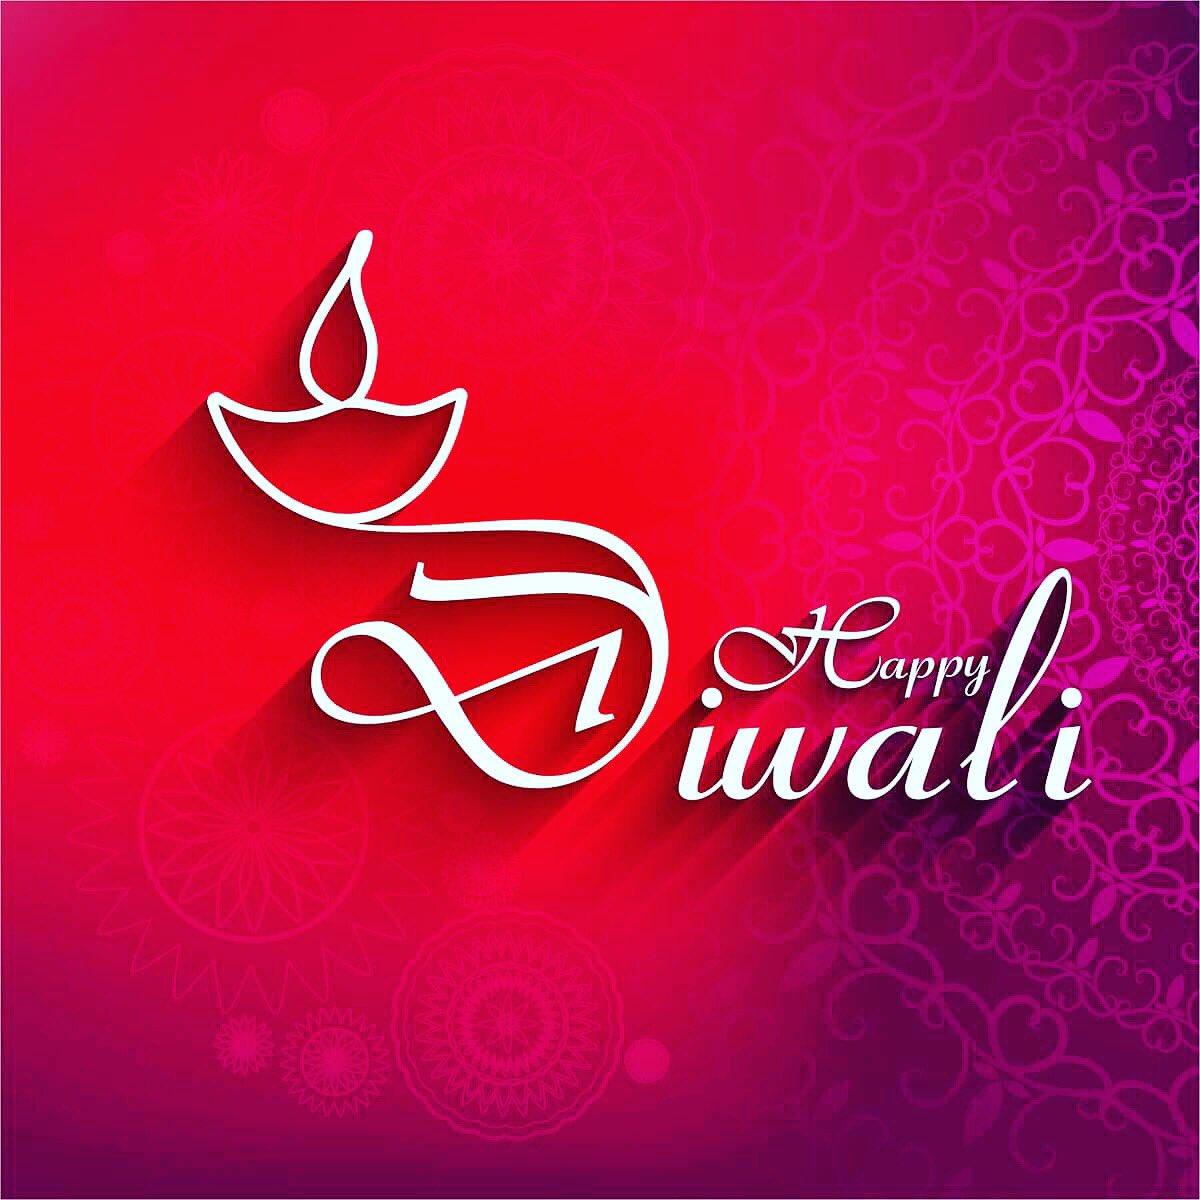 Thank u for making this Diwali very special  #Ninnukori #MOM #JaiLavakusa<br>http://pic.twitter.com/s4Lfqr5Ldf